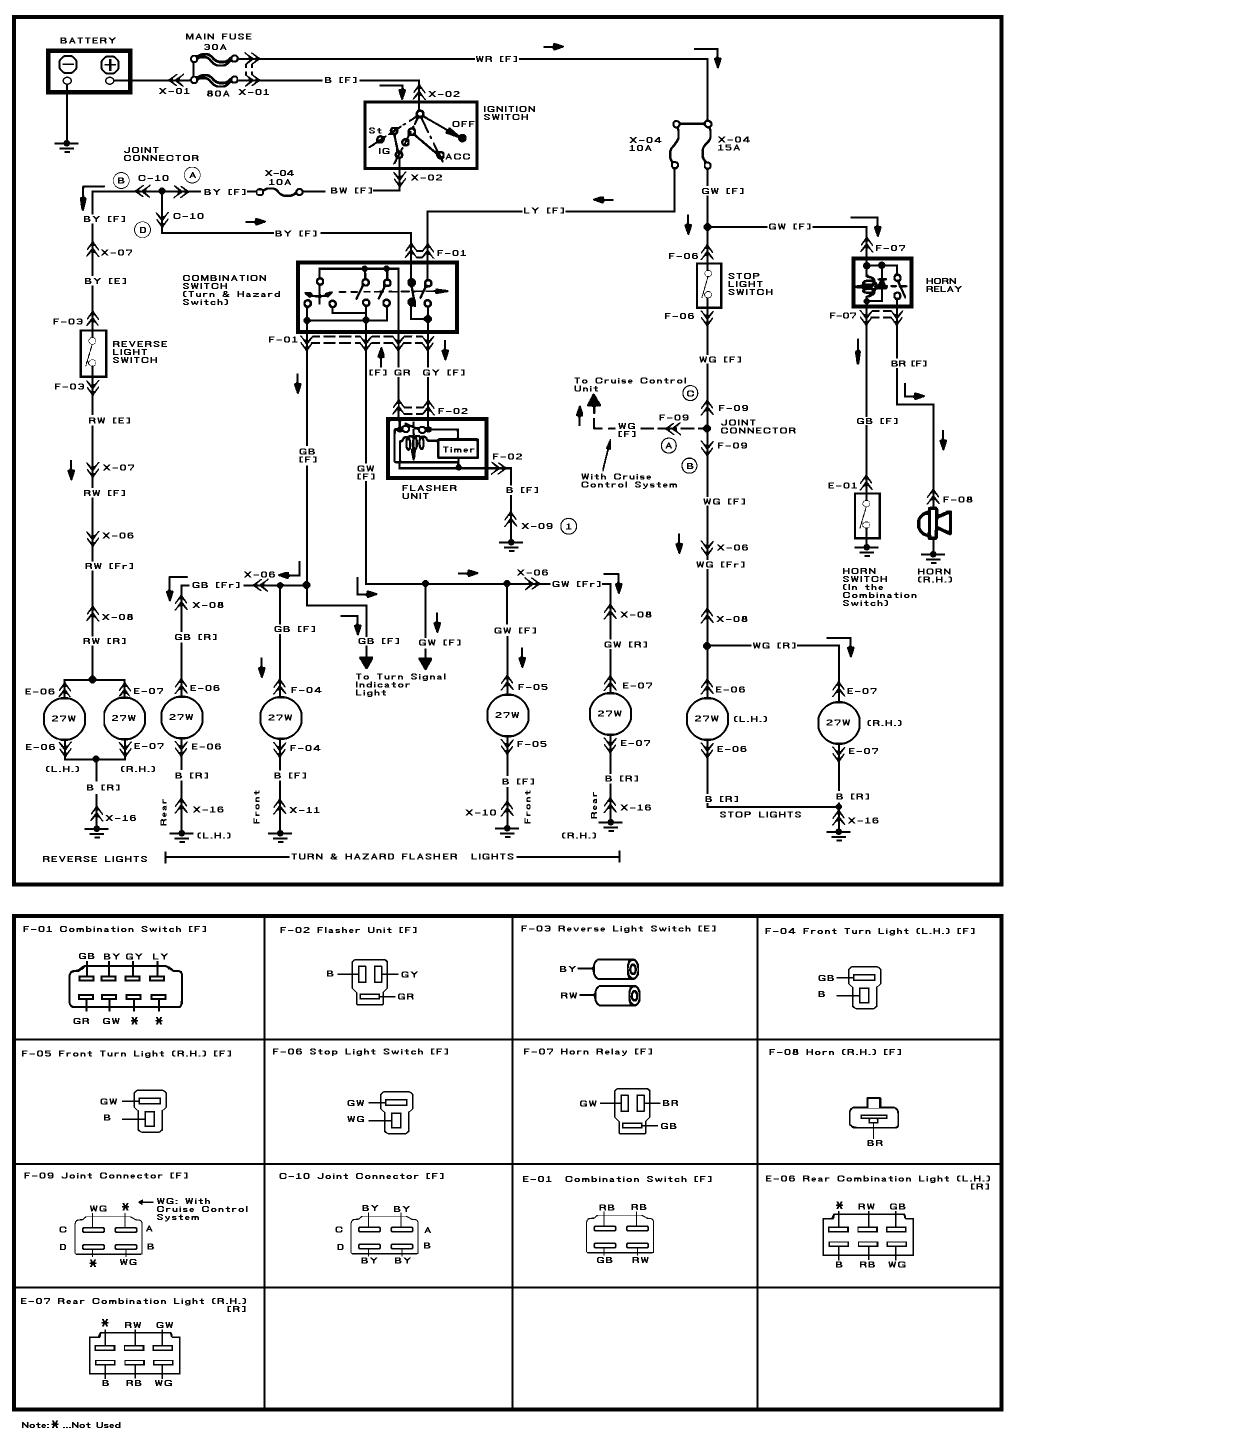 2009 10 17 211957 86 mazda truck wiring png